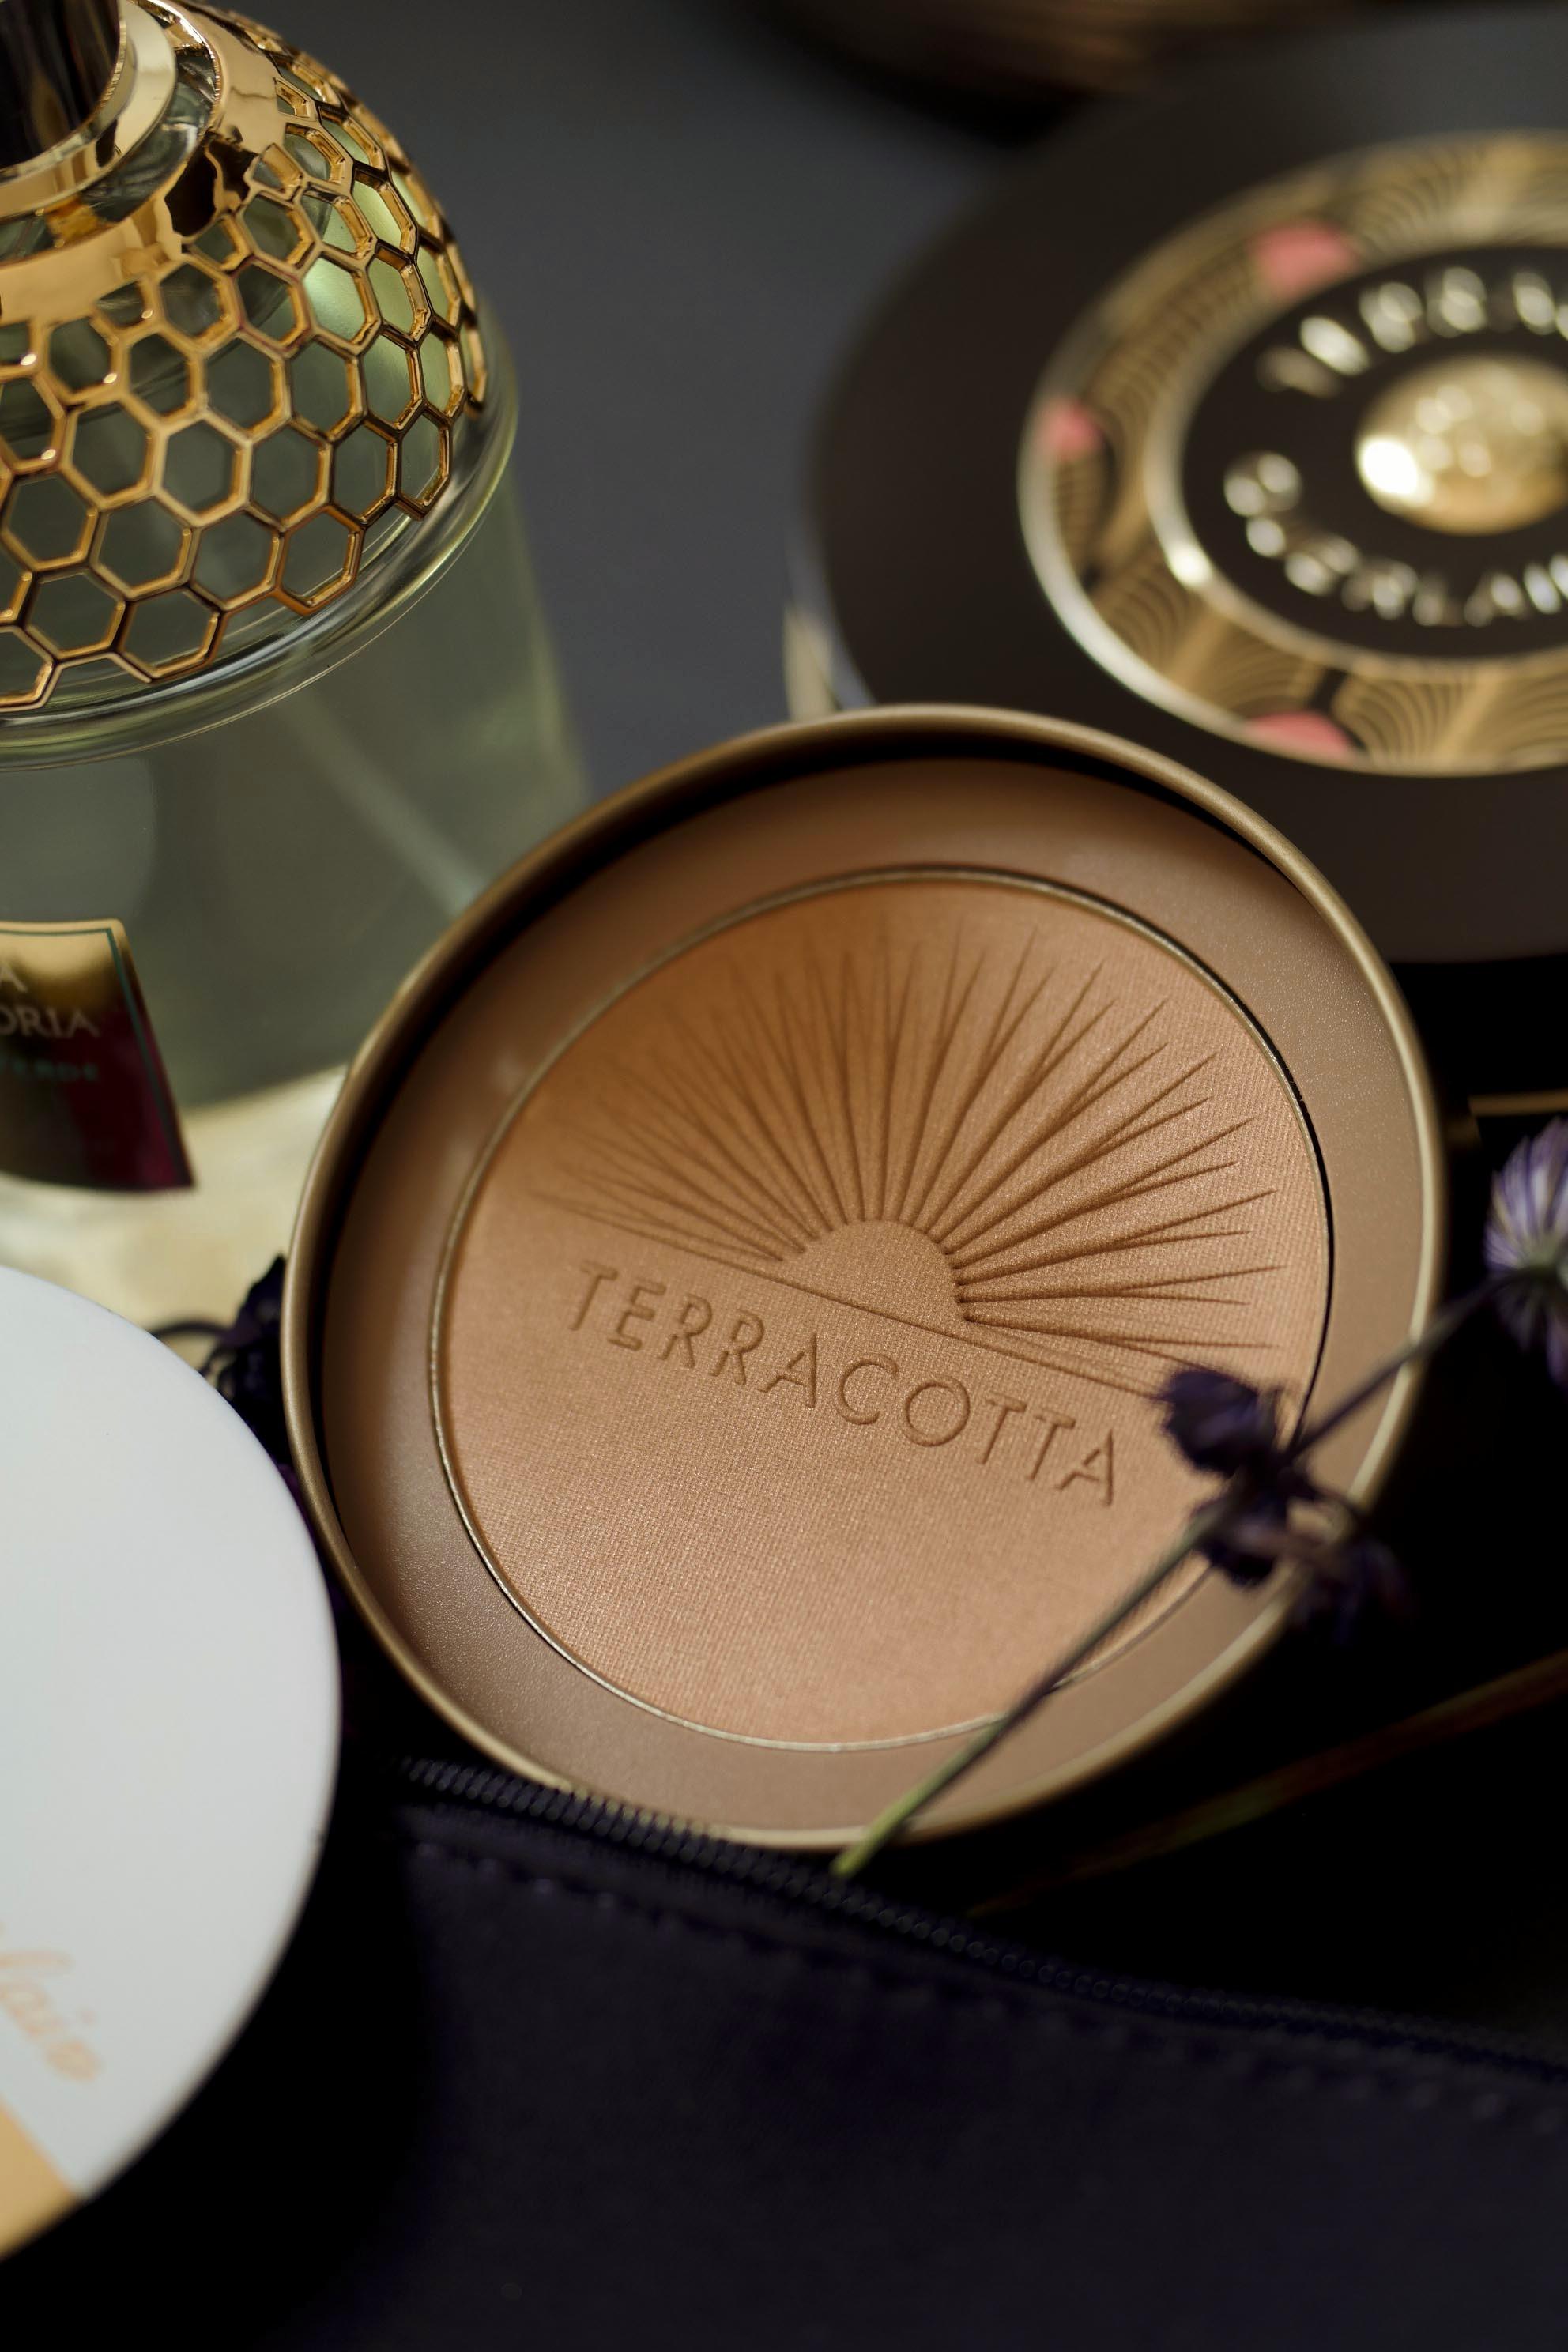 Terracotta Ultra Shine | Guerlain